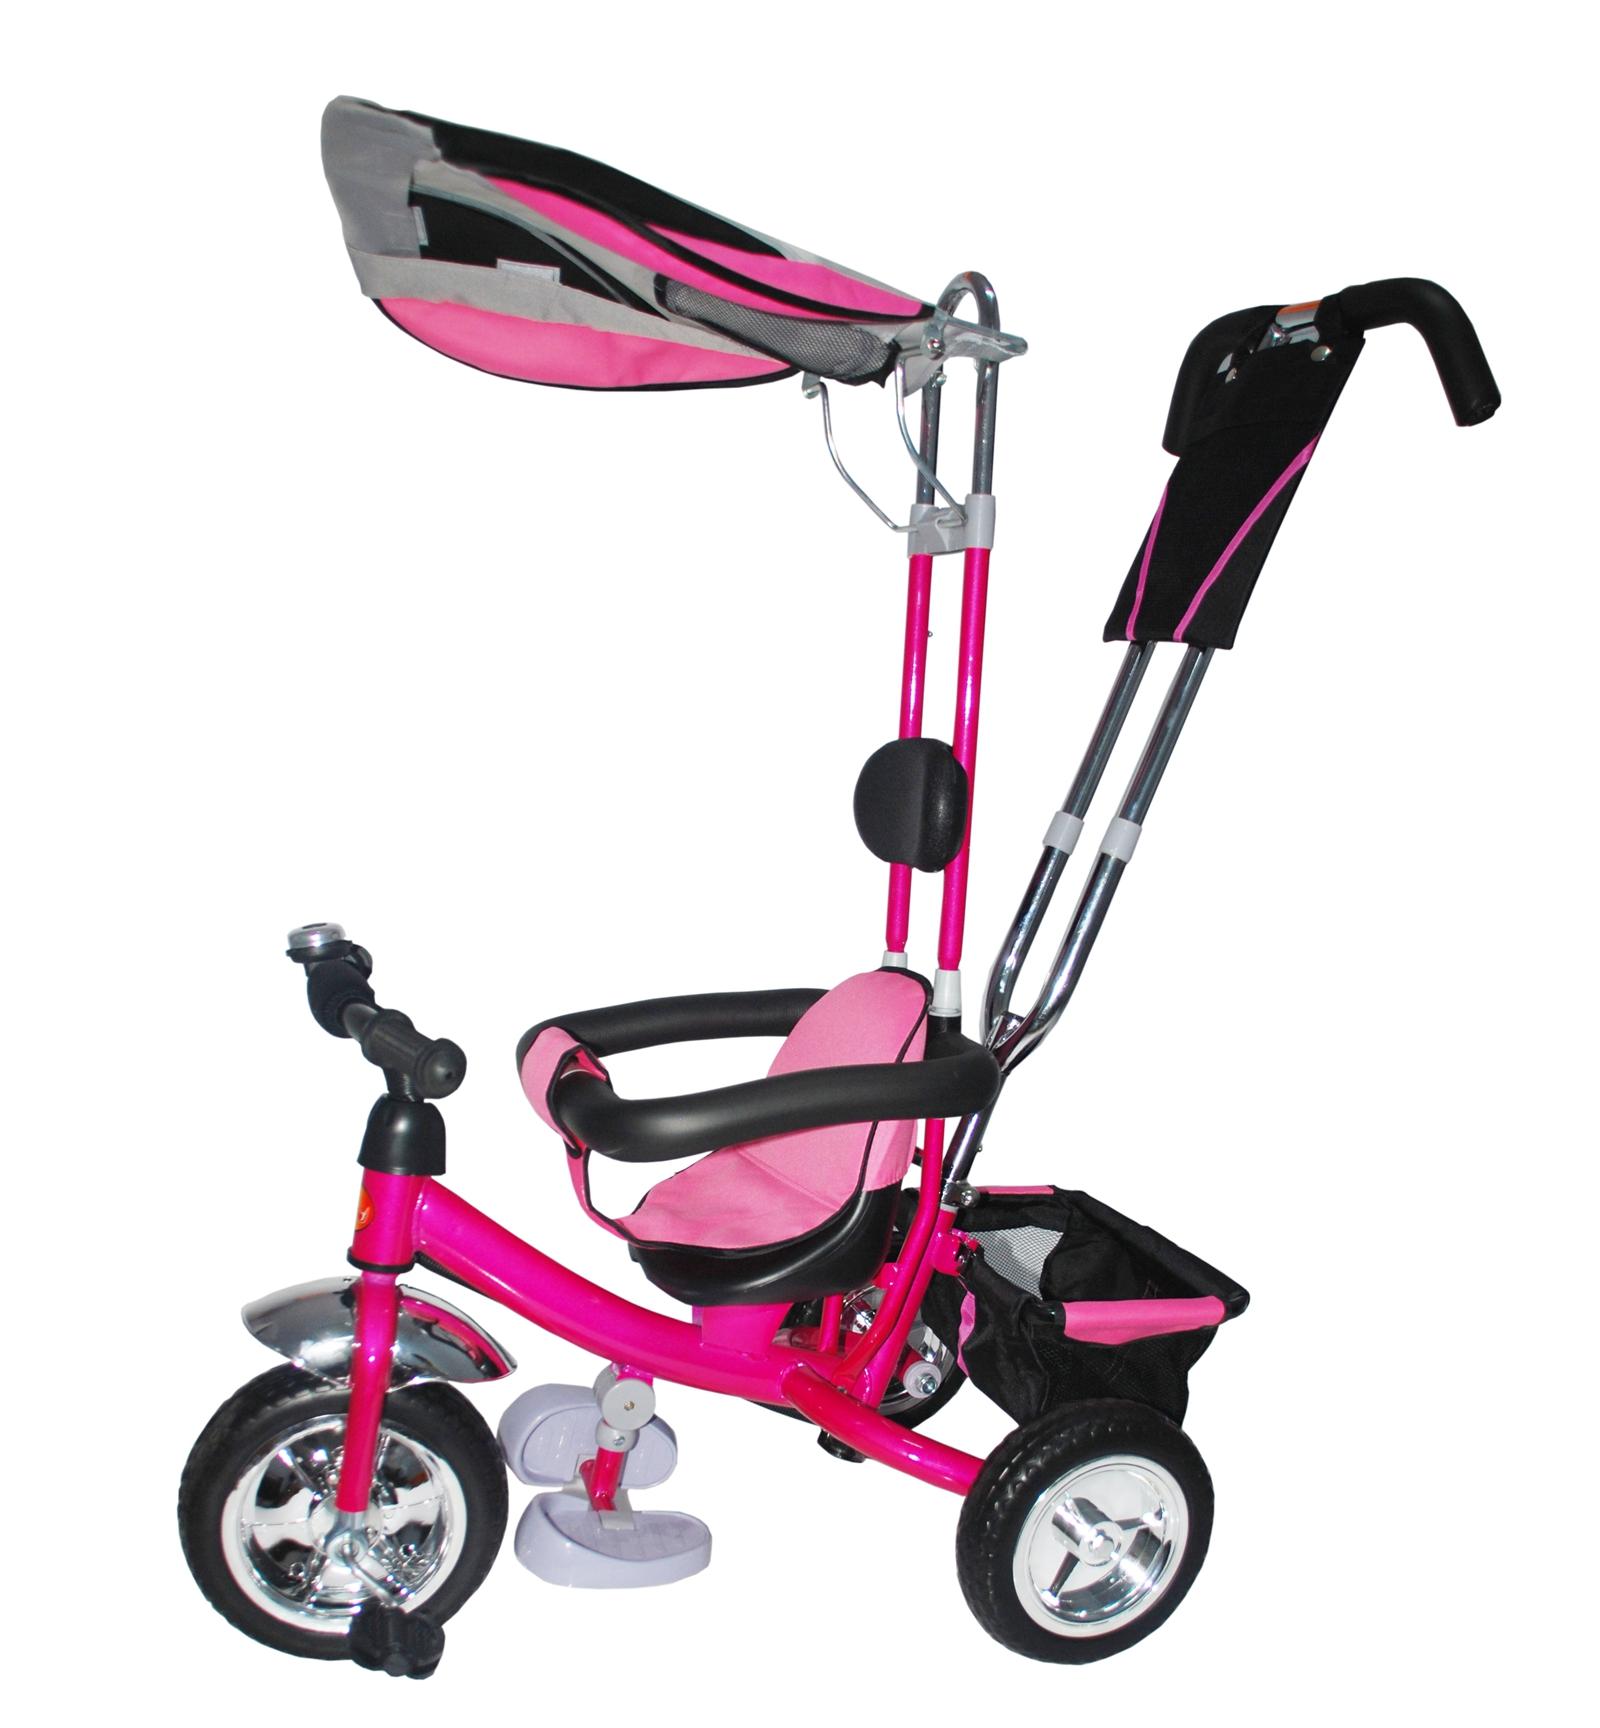 Foxhunter Children Kids Trike Tricycle 3 Wheel 4in1 Ride